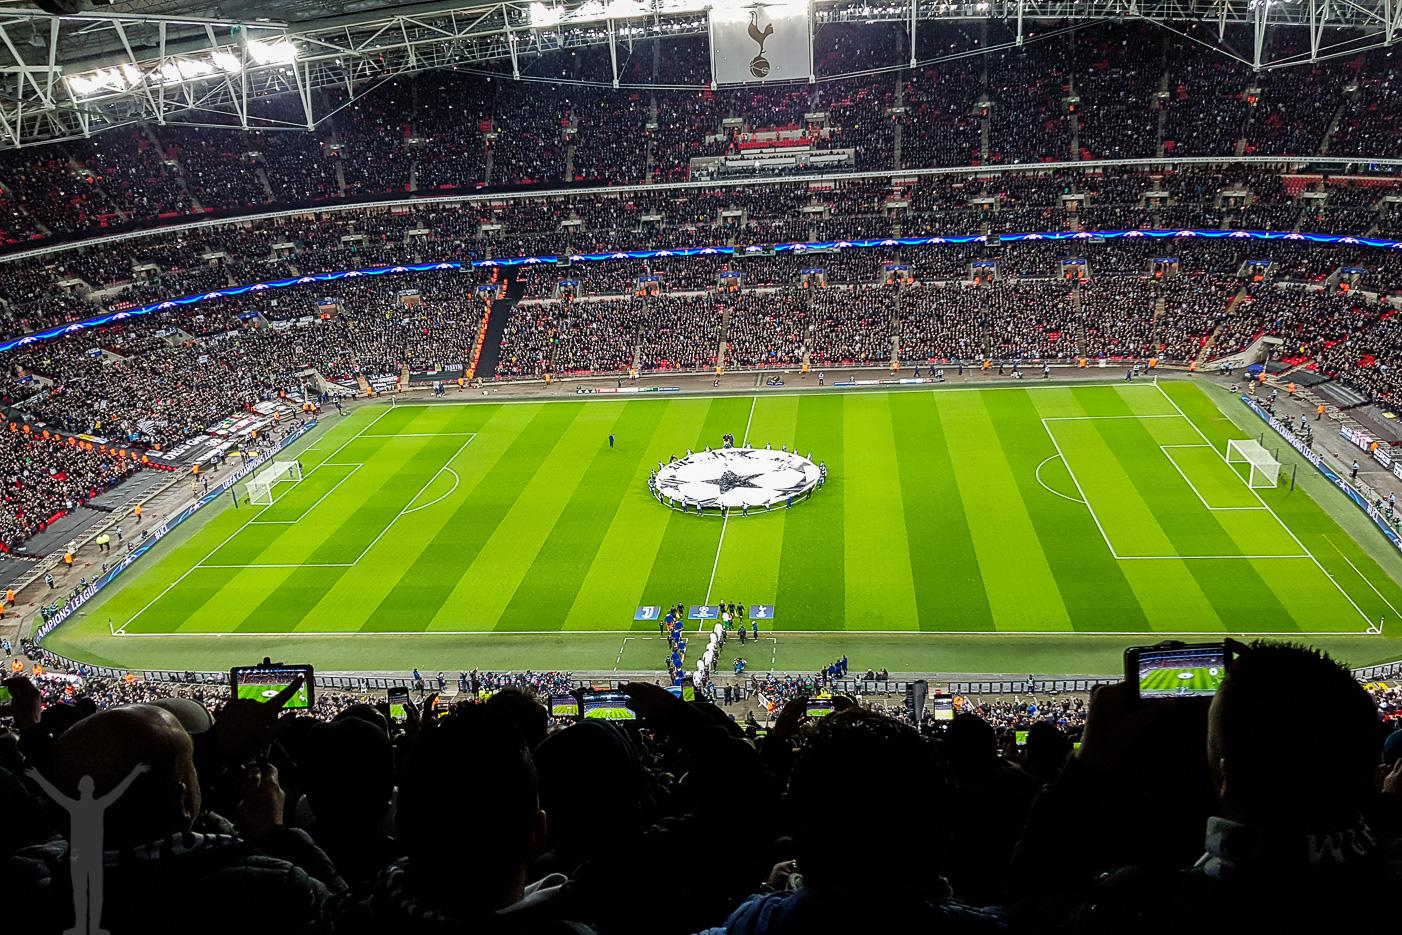 Champions League på Wembley i London